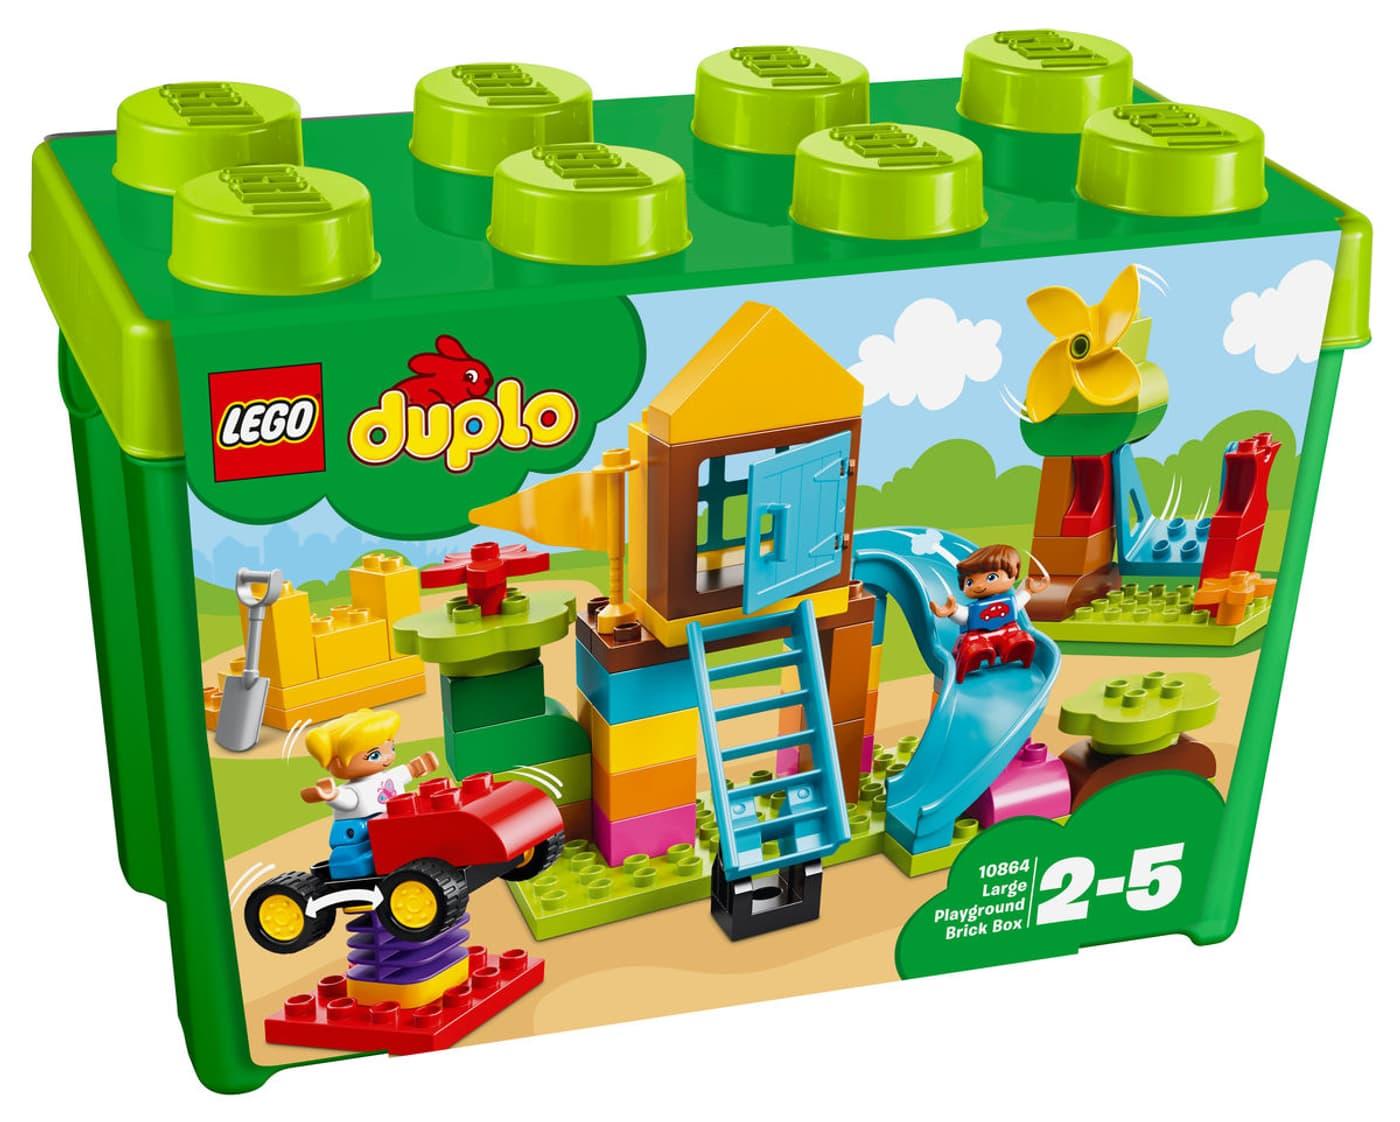 Calendrier Avent Duplo.Lego Duplo 10864 Boite Terrain De Jeu